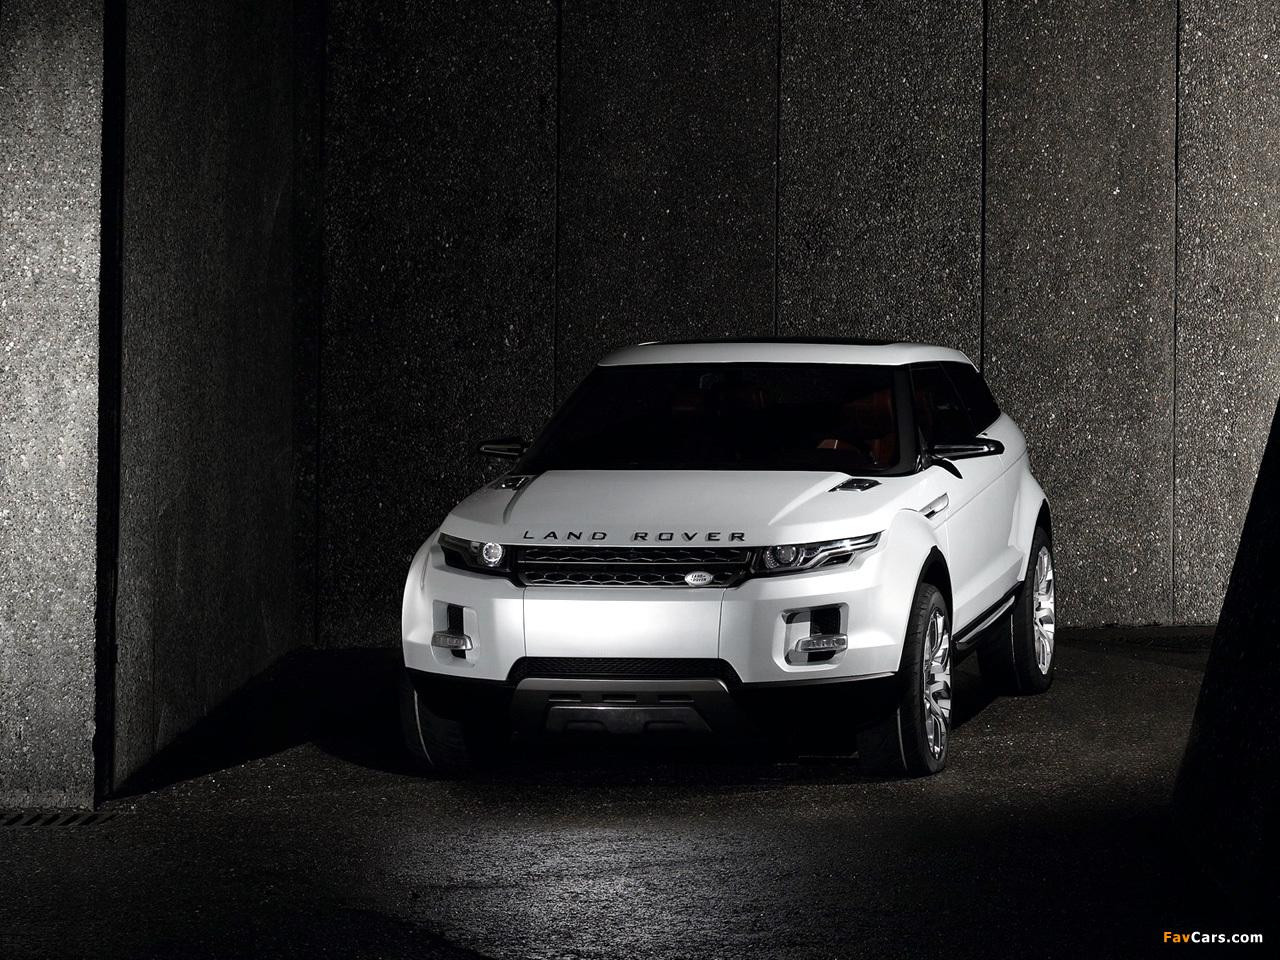 Land Rover LRX Concept 2007 pictures (1280 x 960)